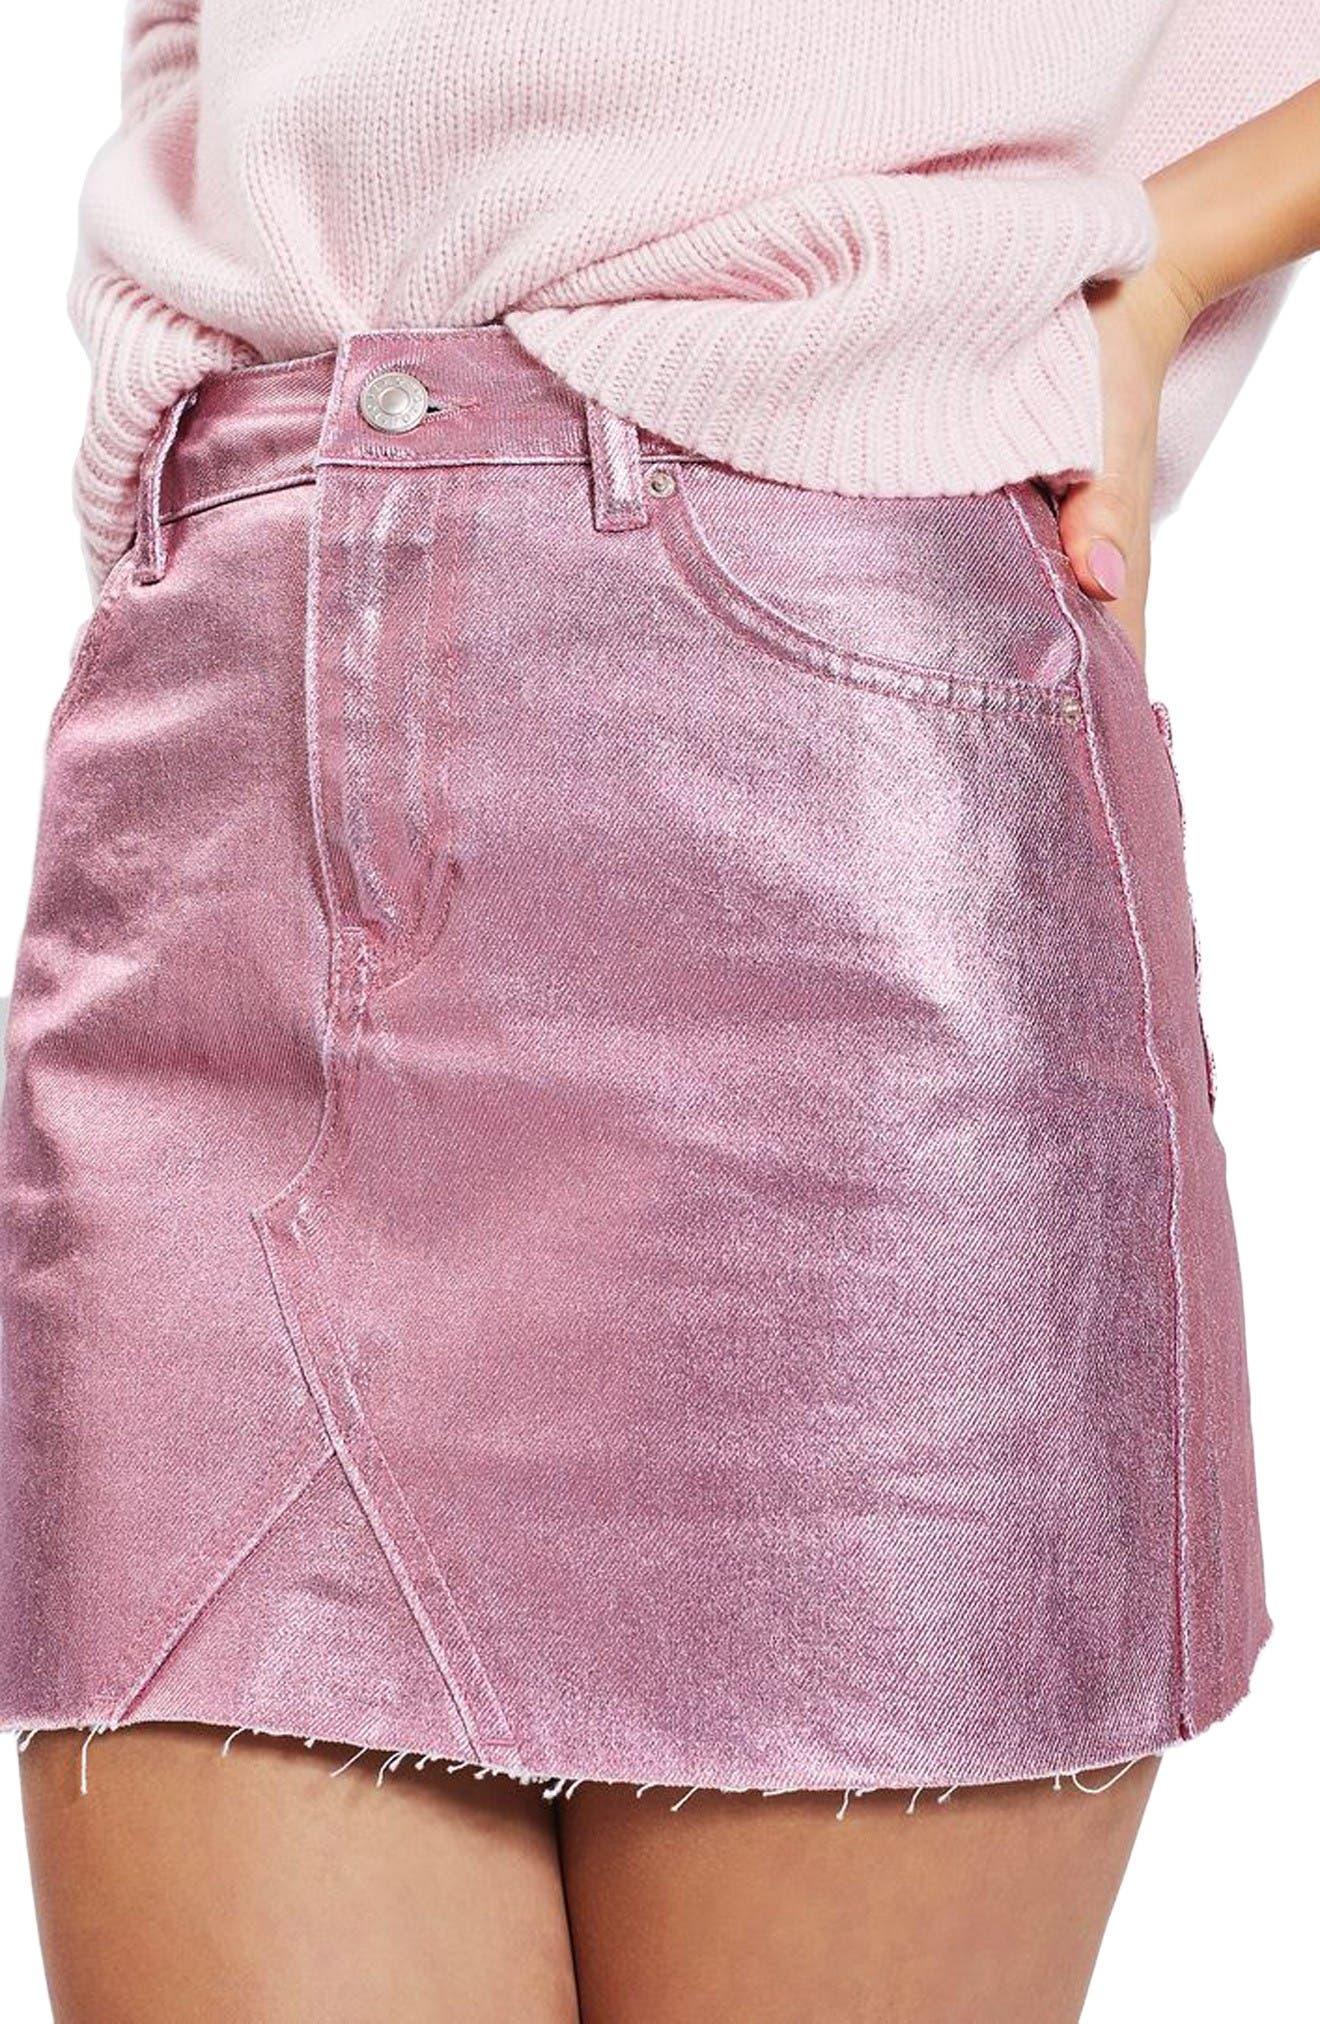 Alternate Image 1 Selected - Topshop Moto High Waist Metallic Denim Miniskirt (Regular & Petite)